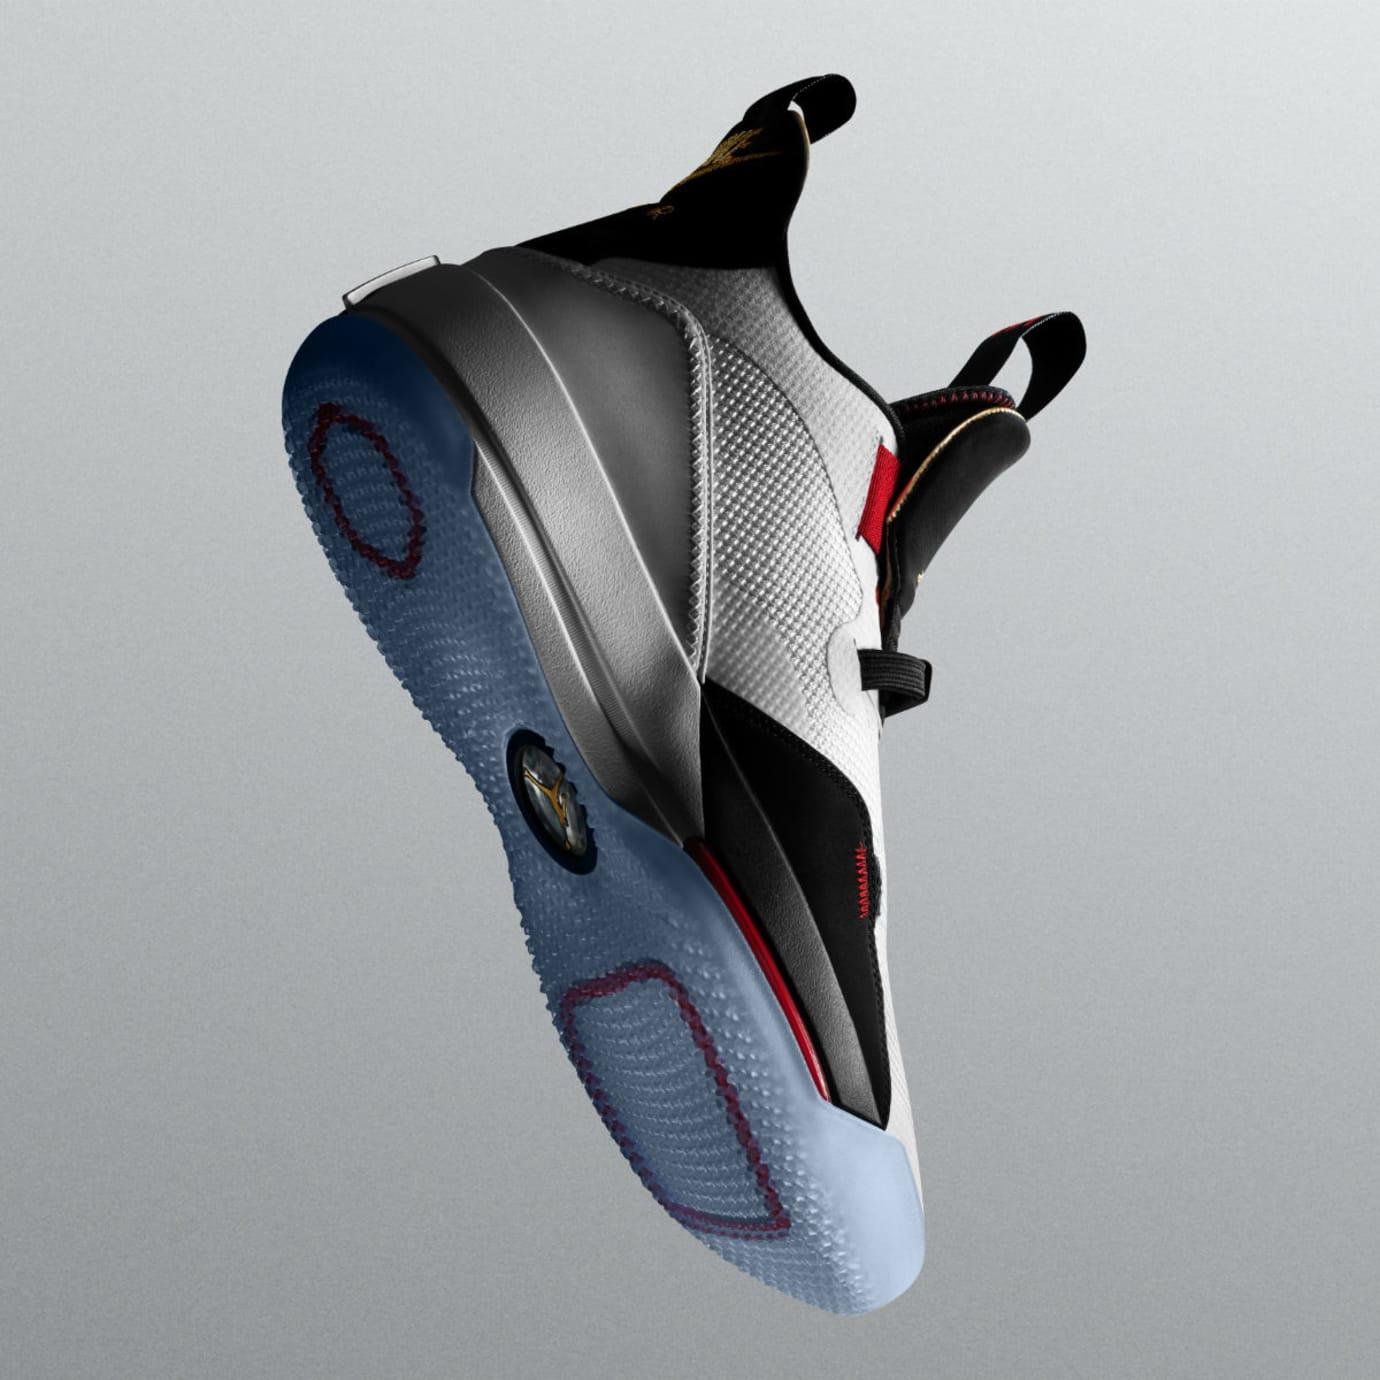 Image via Nike Air Jordan 33 White Black Red Release Date Sole fcfb06ecb